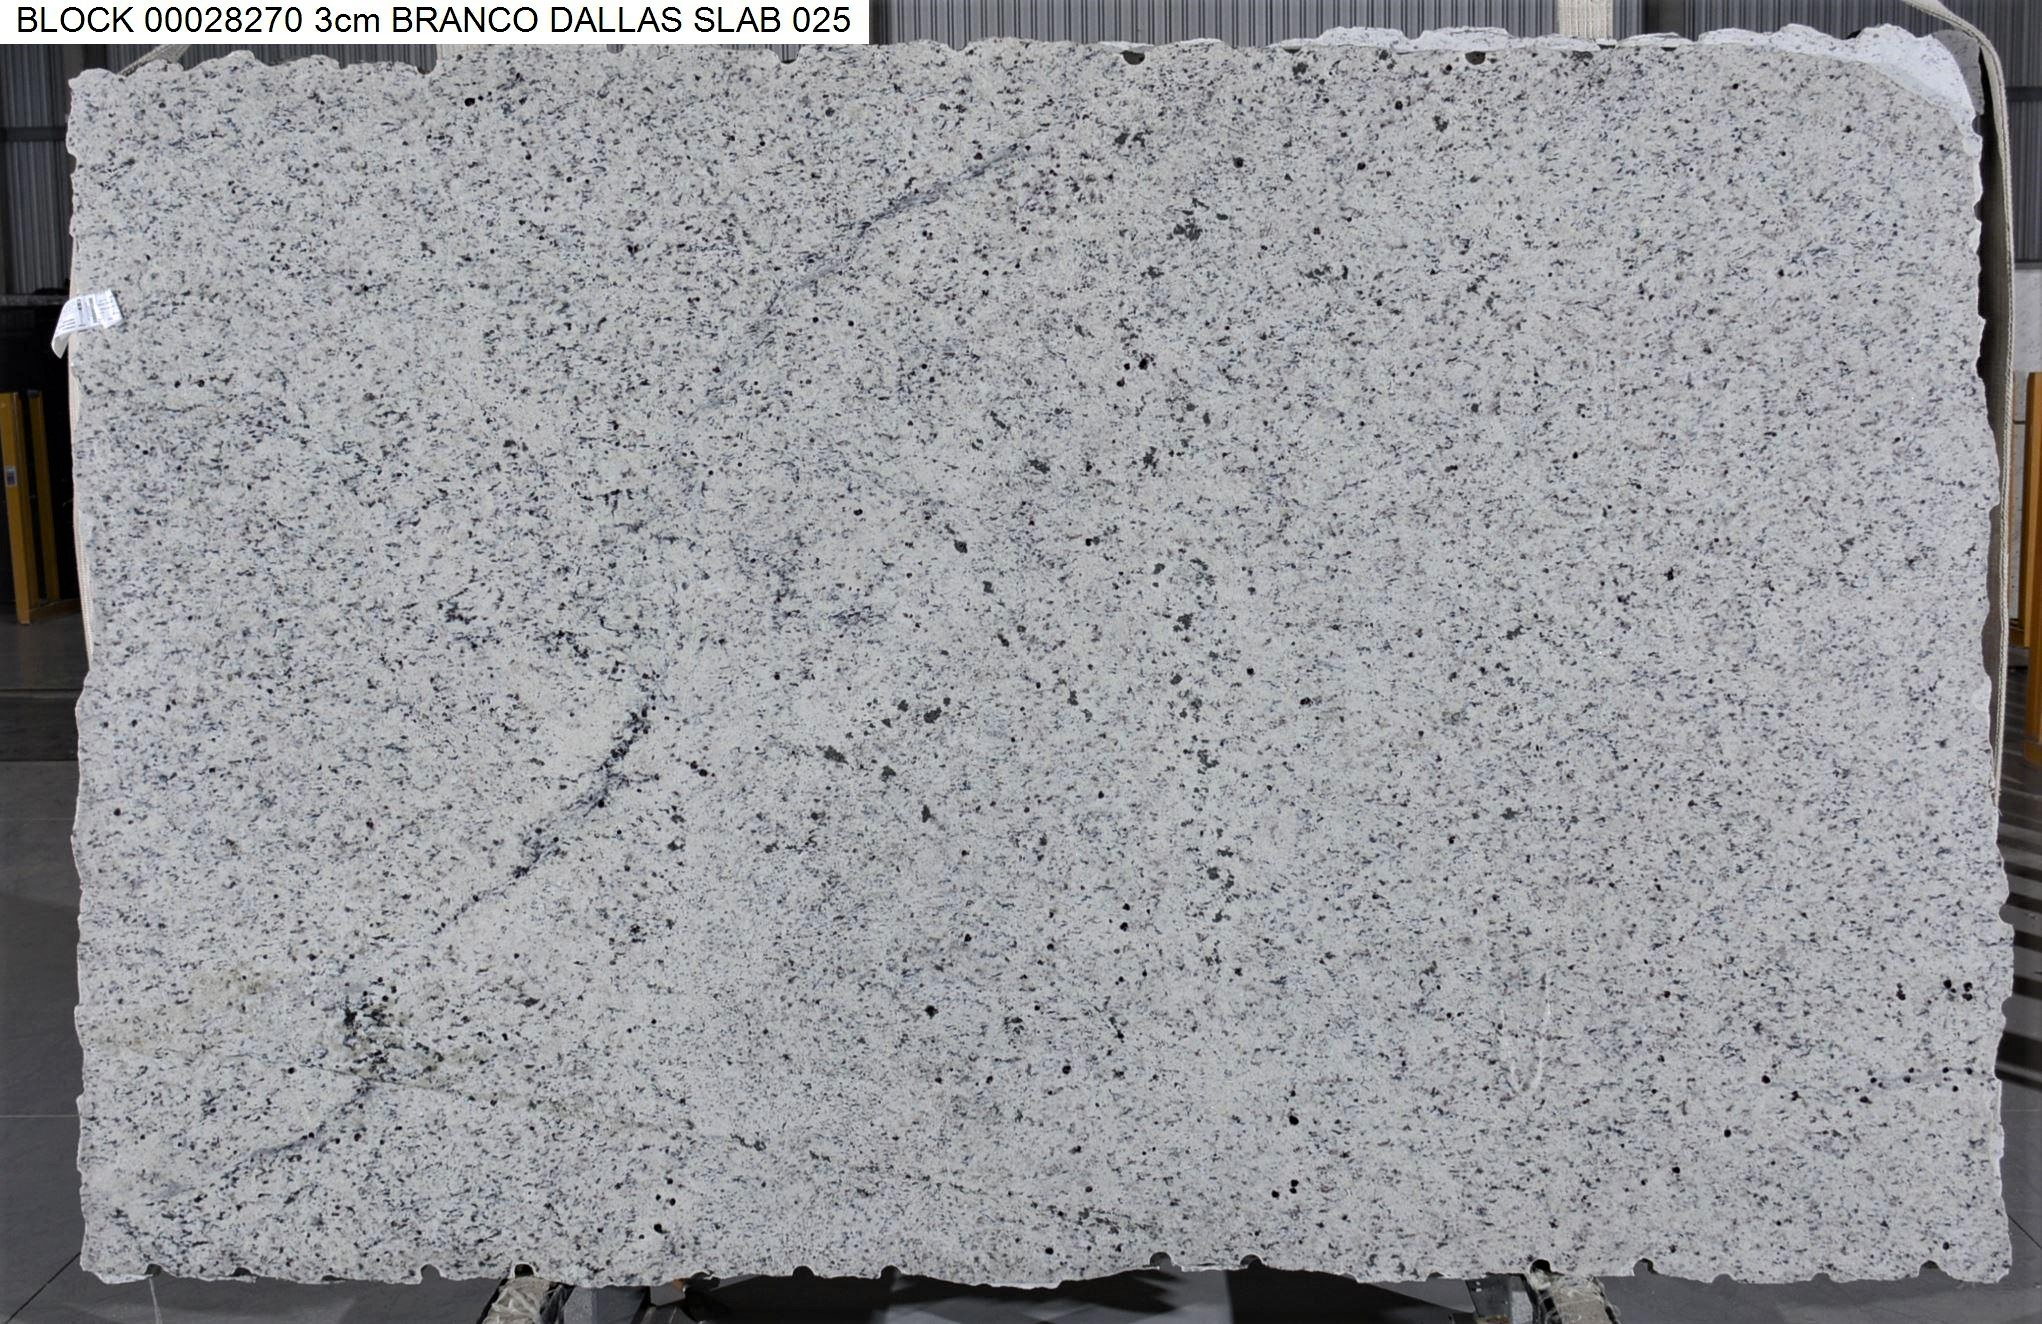 DALLAS WHITE (T) COMMERCIAL 3CM